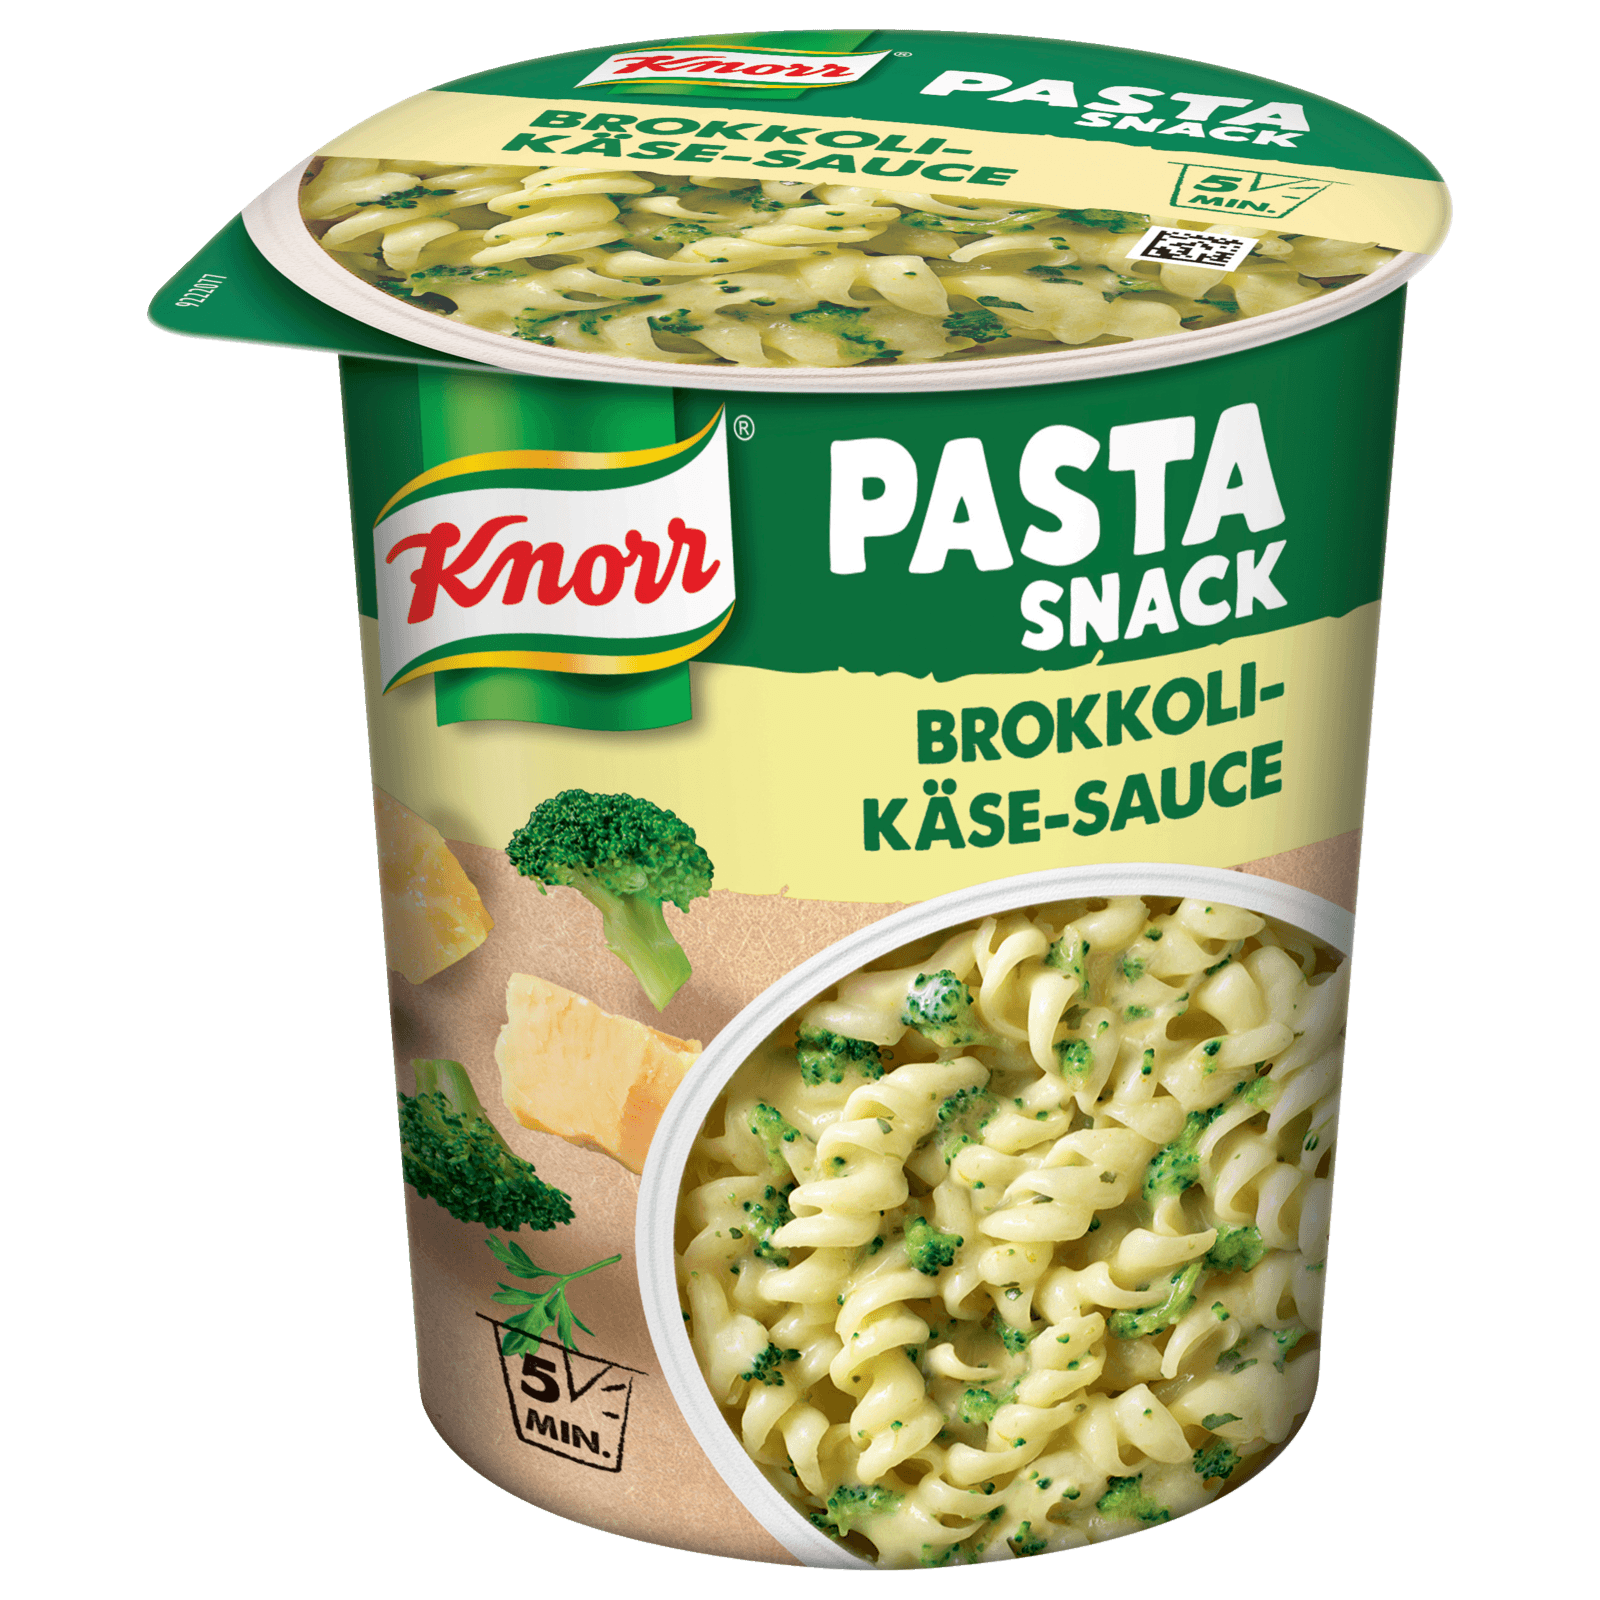 Knorr Pasta Snack Brokkoli-Käse-Sauce 1 Portion